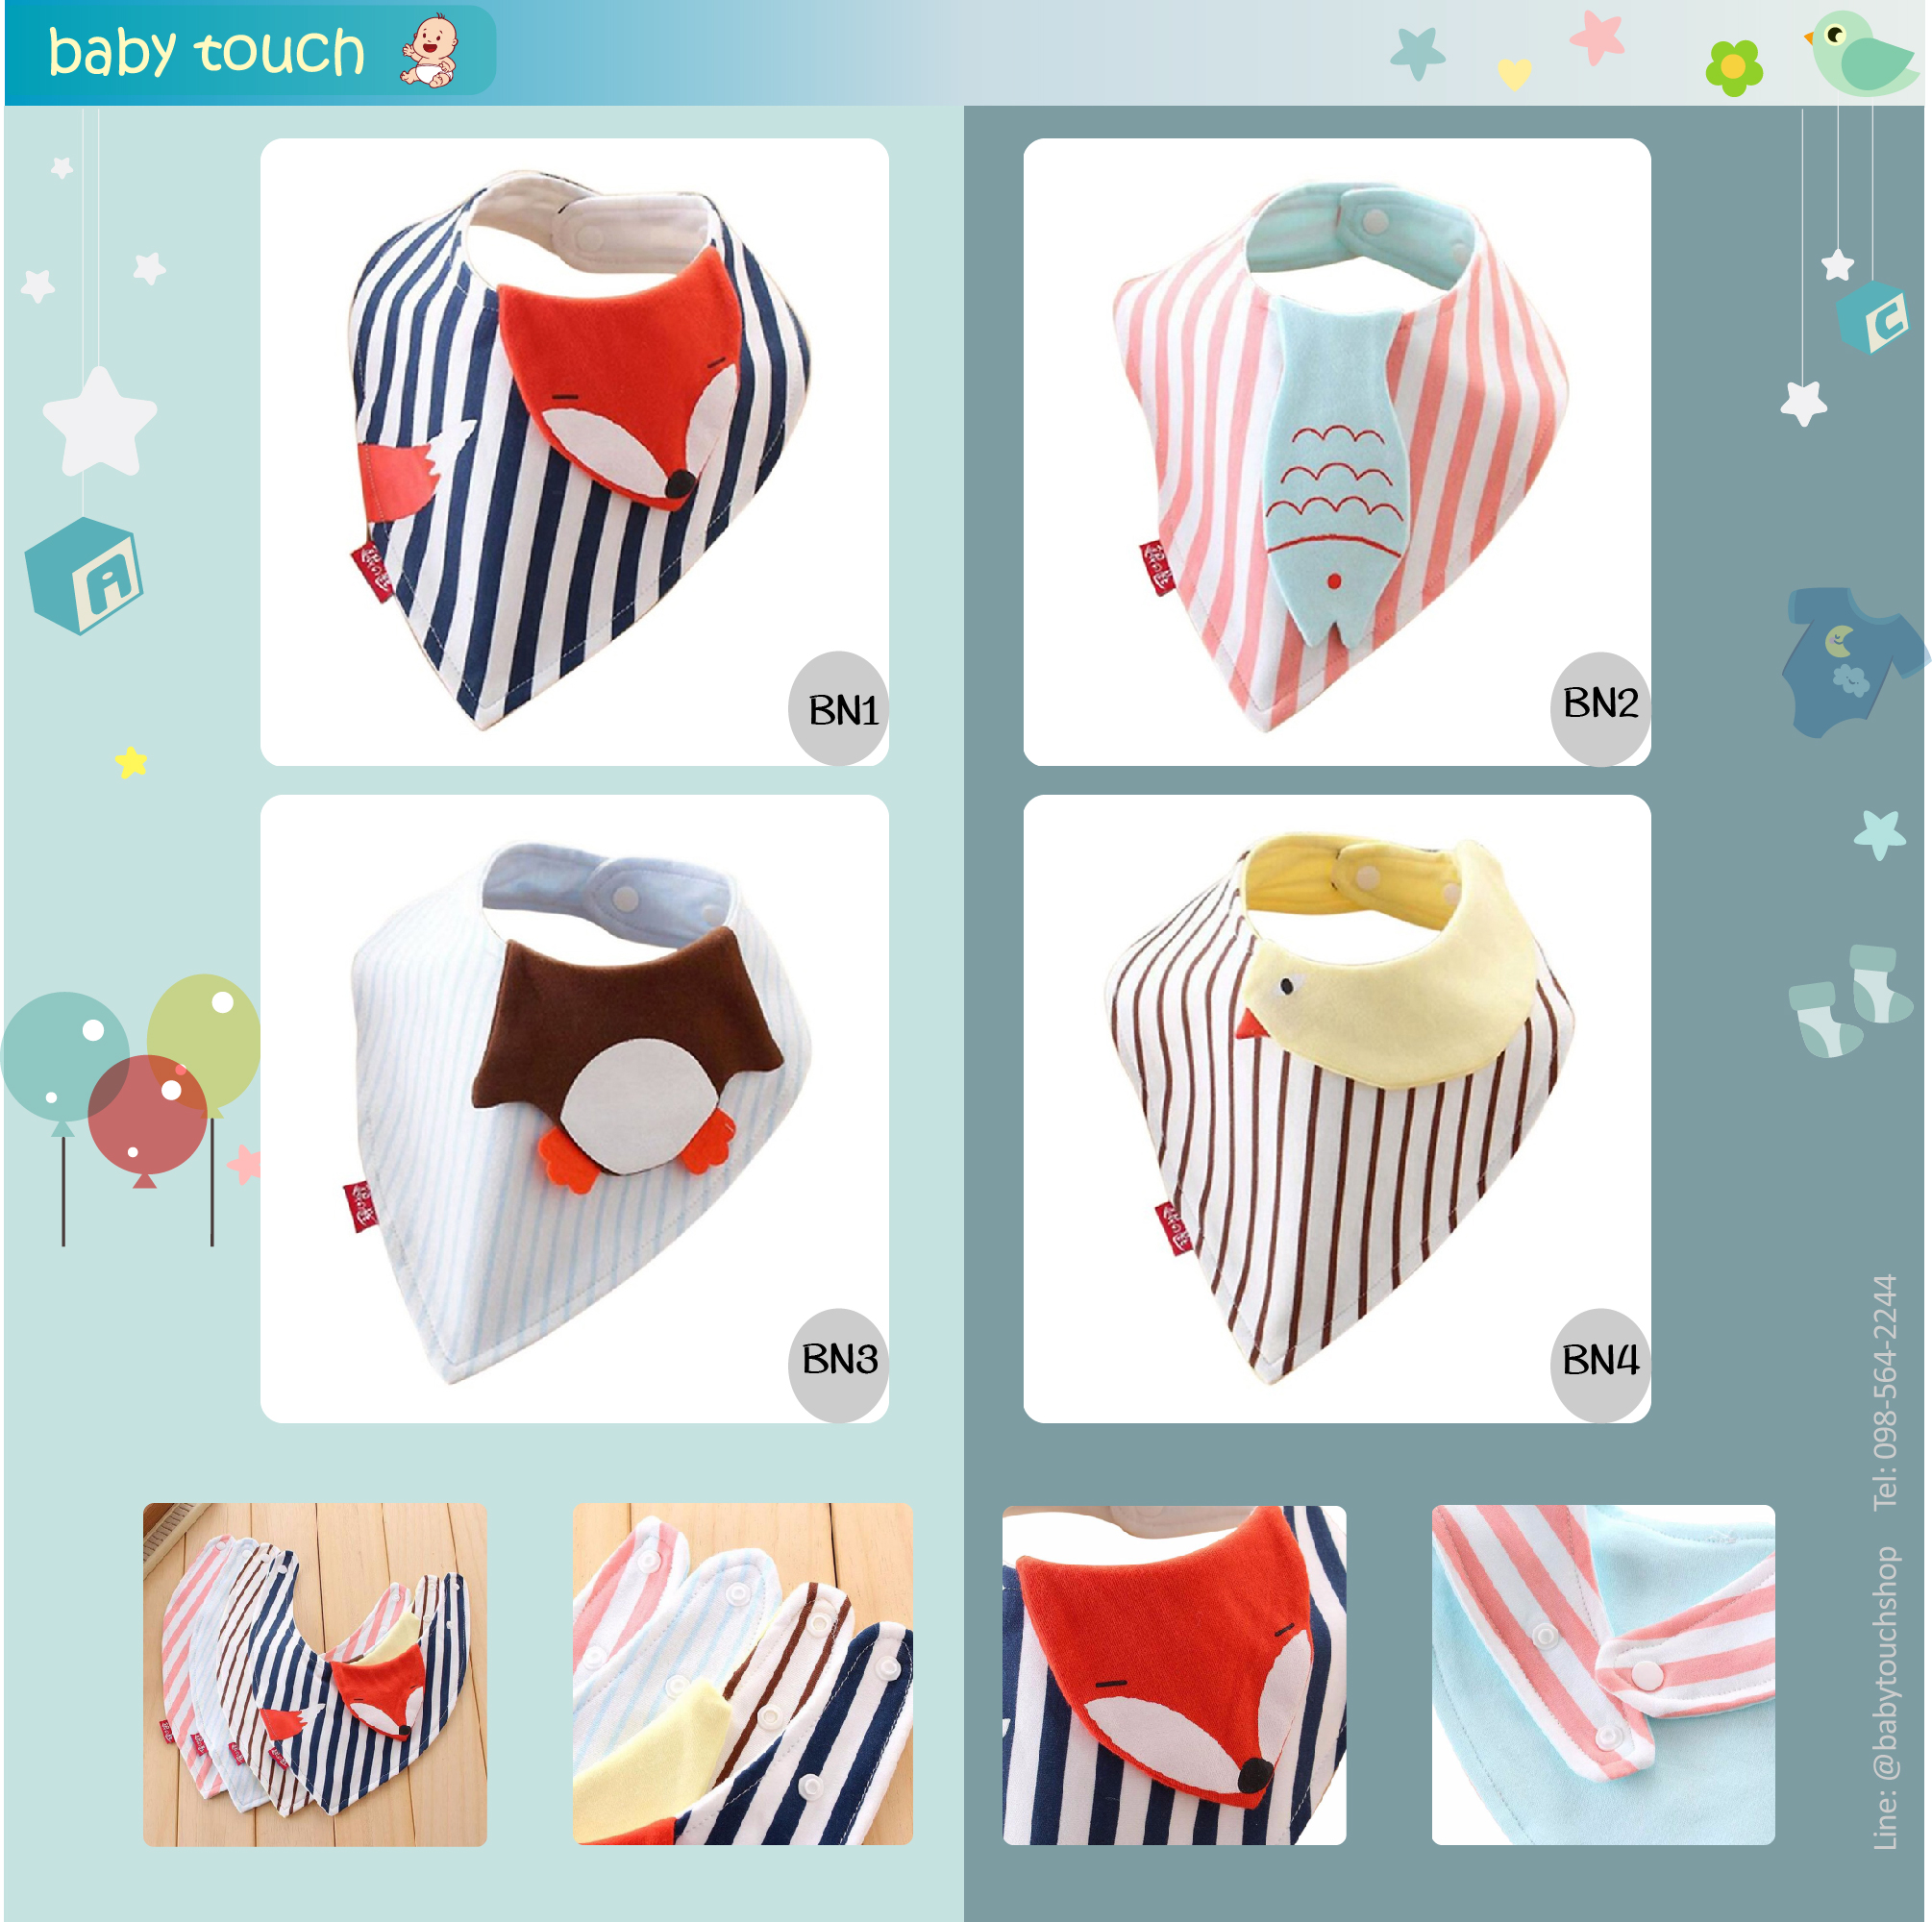 Baby Touch ผ้ากันเปื้อนเด็ก ธรรมชาติ (Bibs - BN)